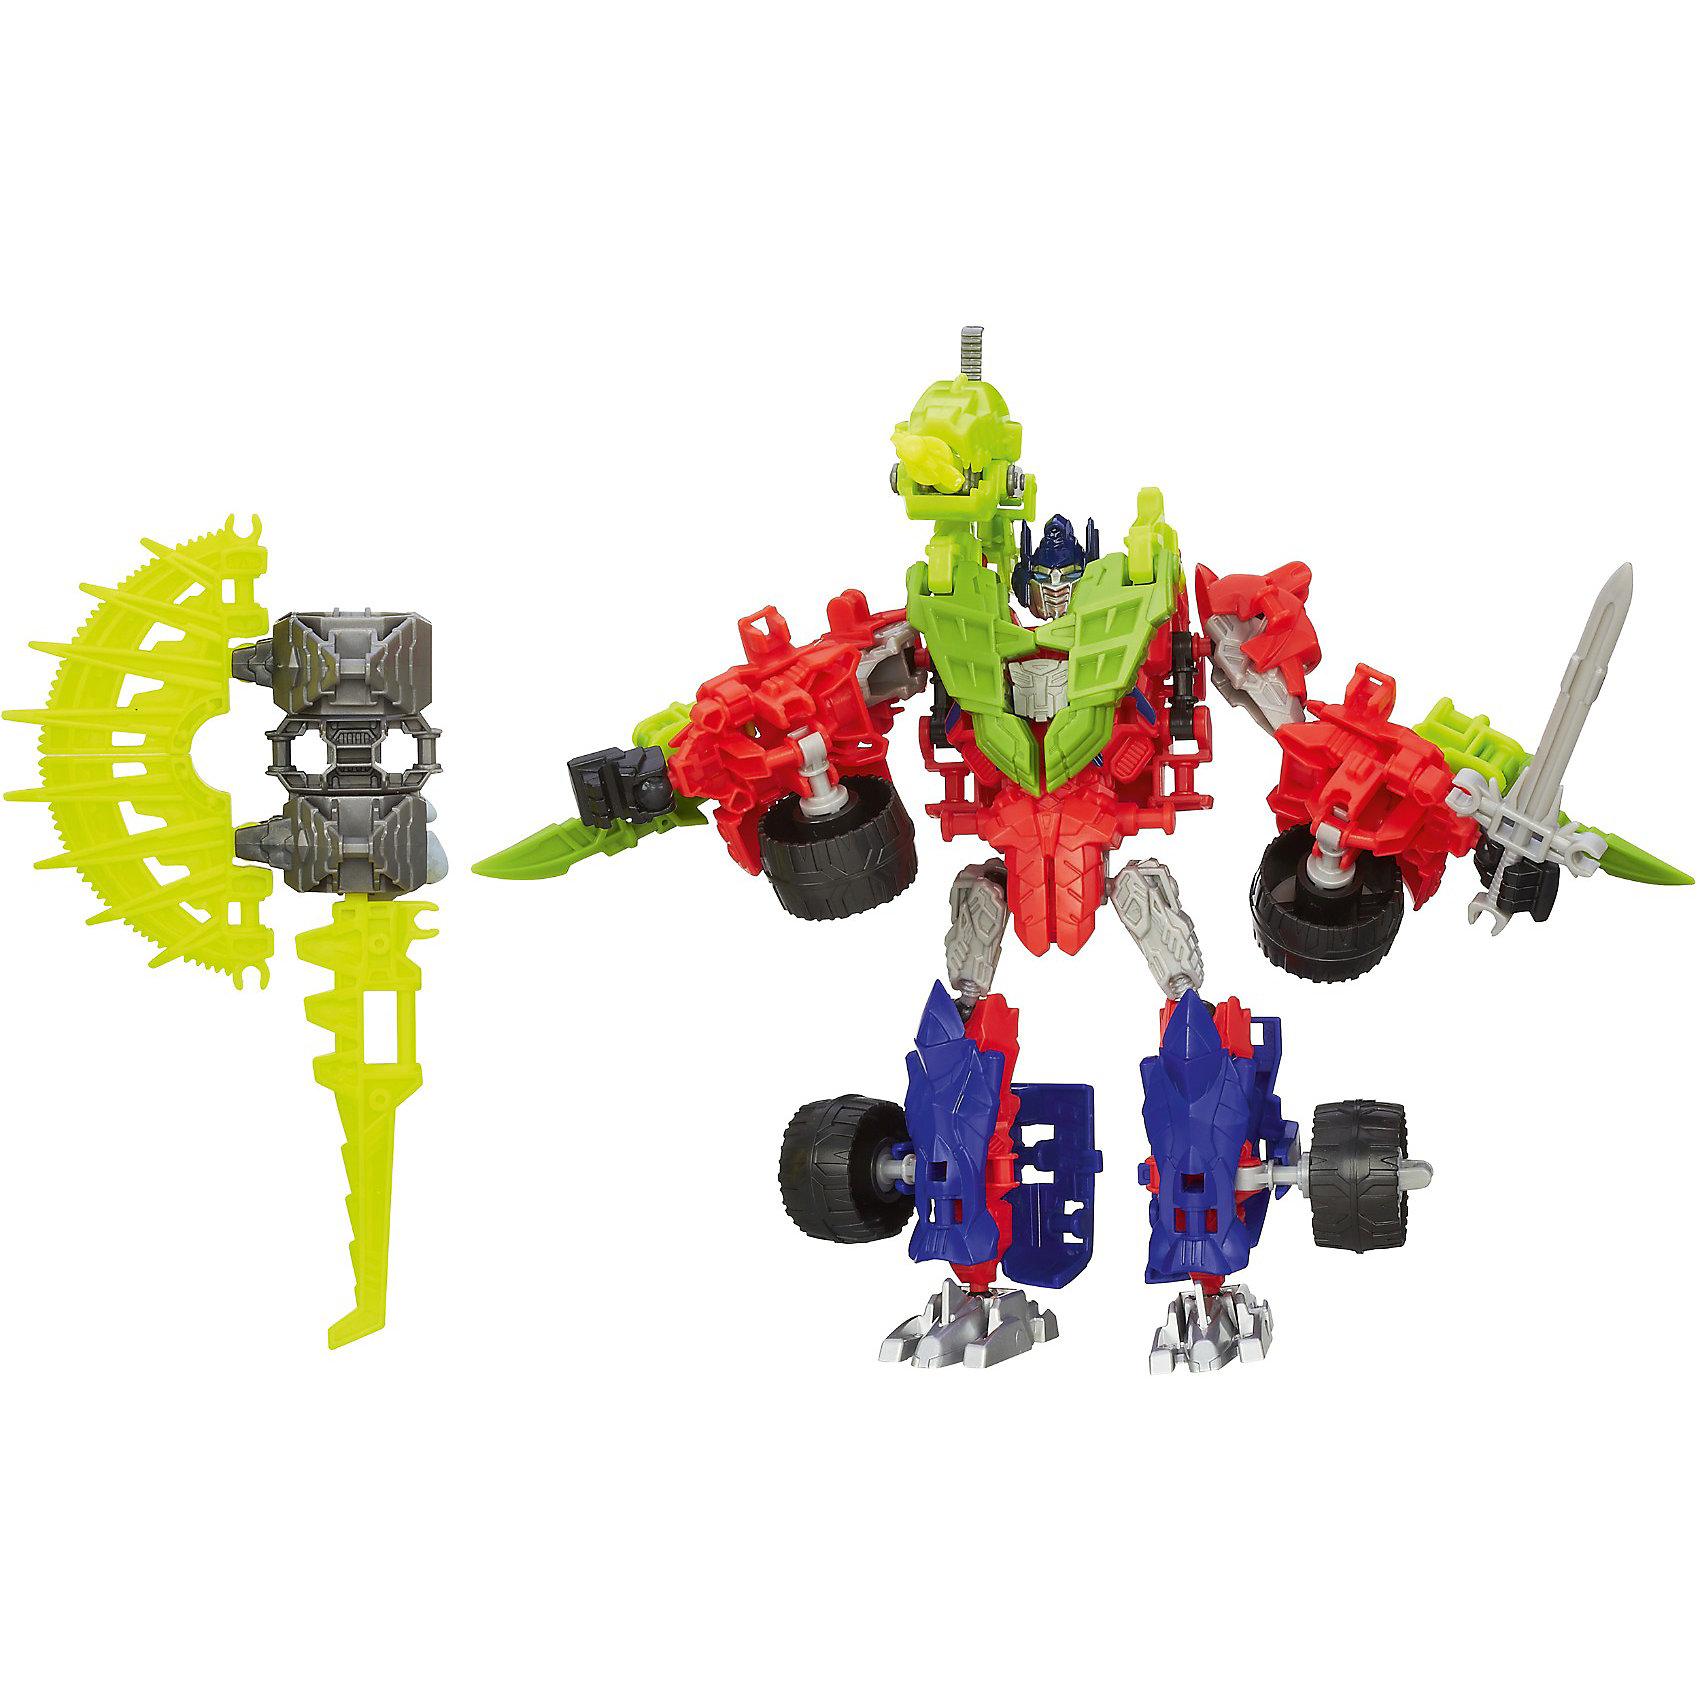 Hasbro Констракт Боты: Диноботы Optimus Prime & Gnaw Dino, Войны, Трансформеры 4 kospel epj 4 4 optimus